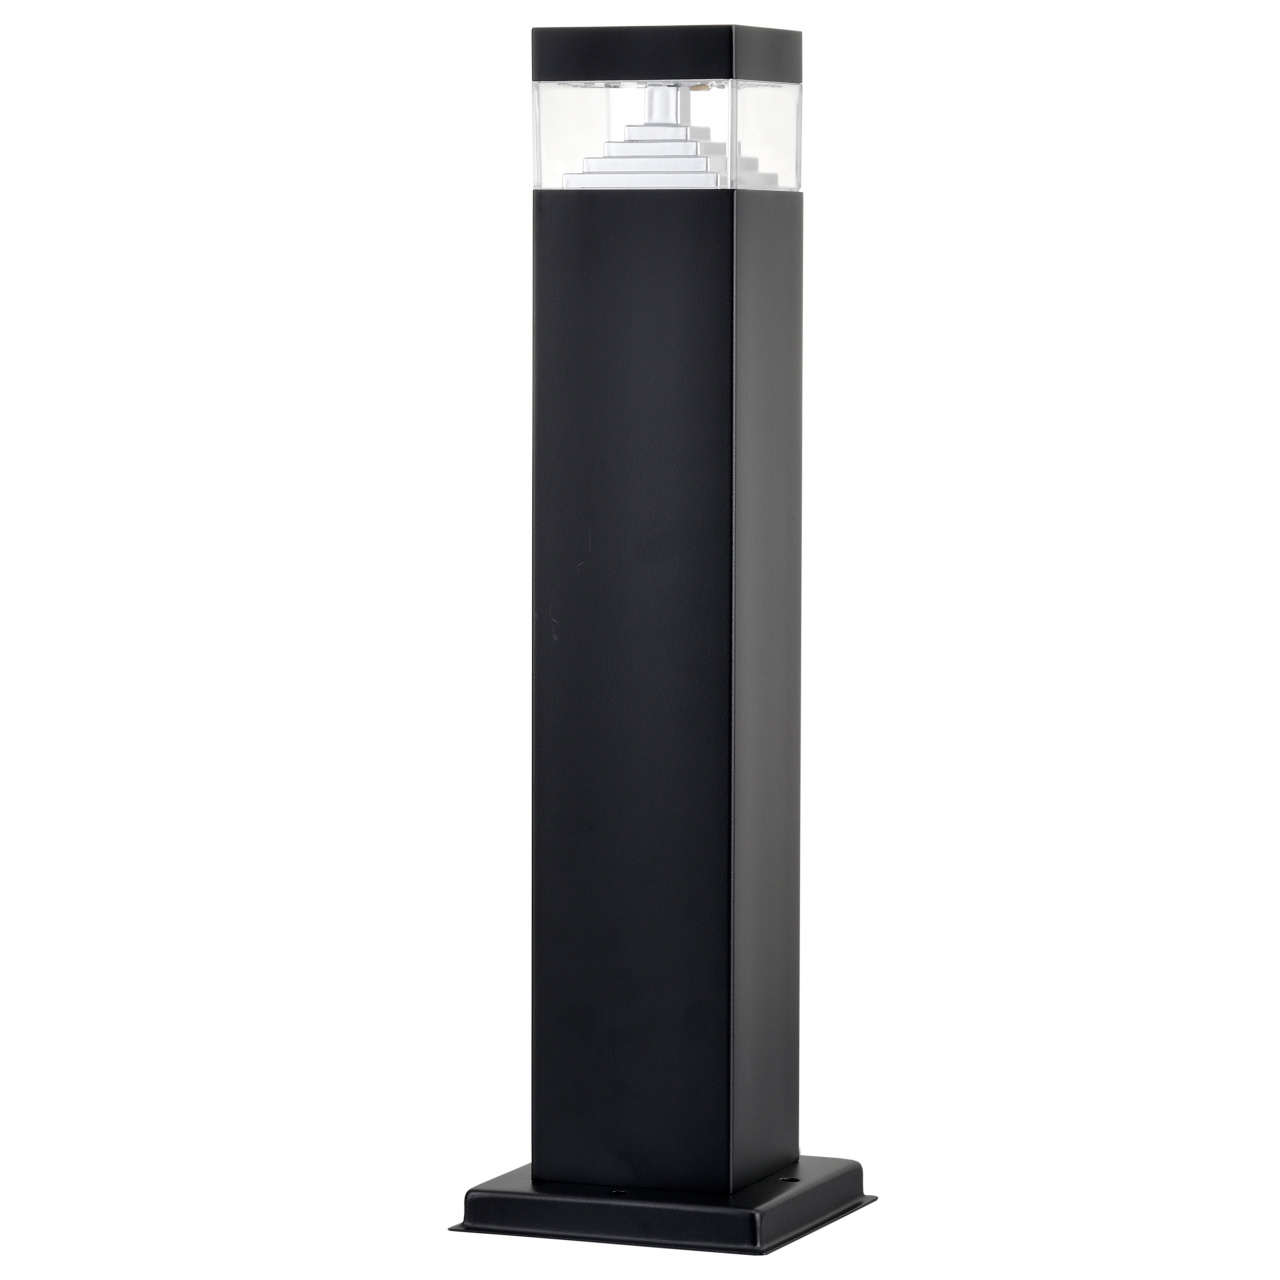 Светильник Raggio LED 6W 300LM черный 4000K IP55 Lightstar 377907